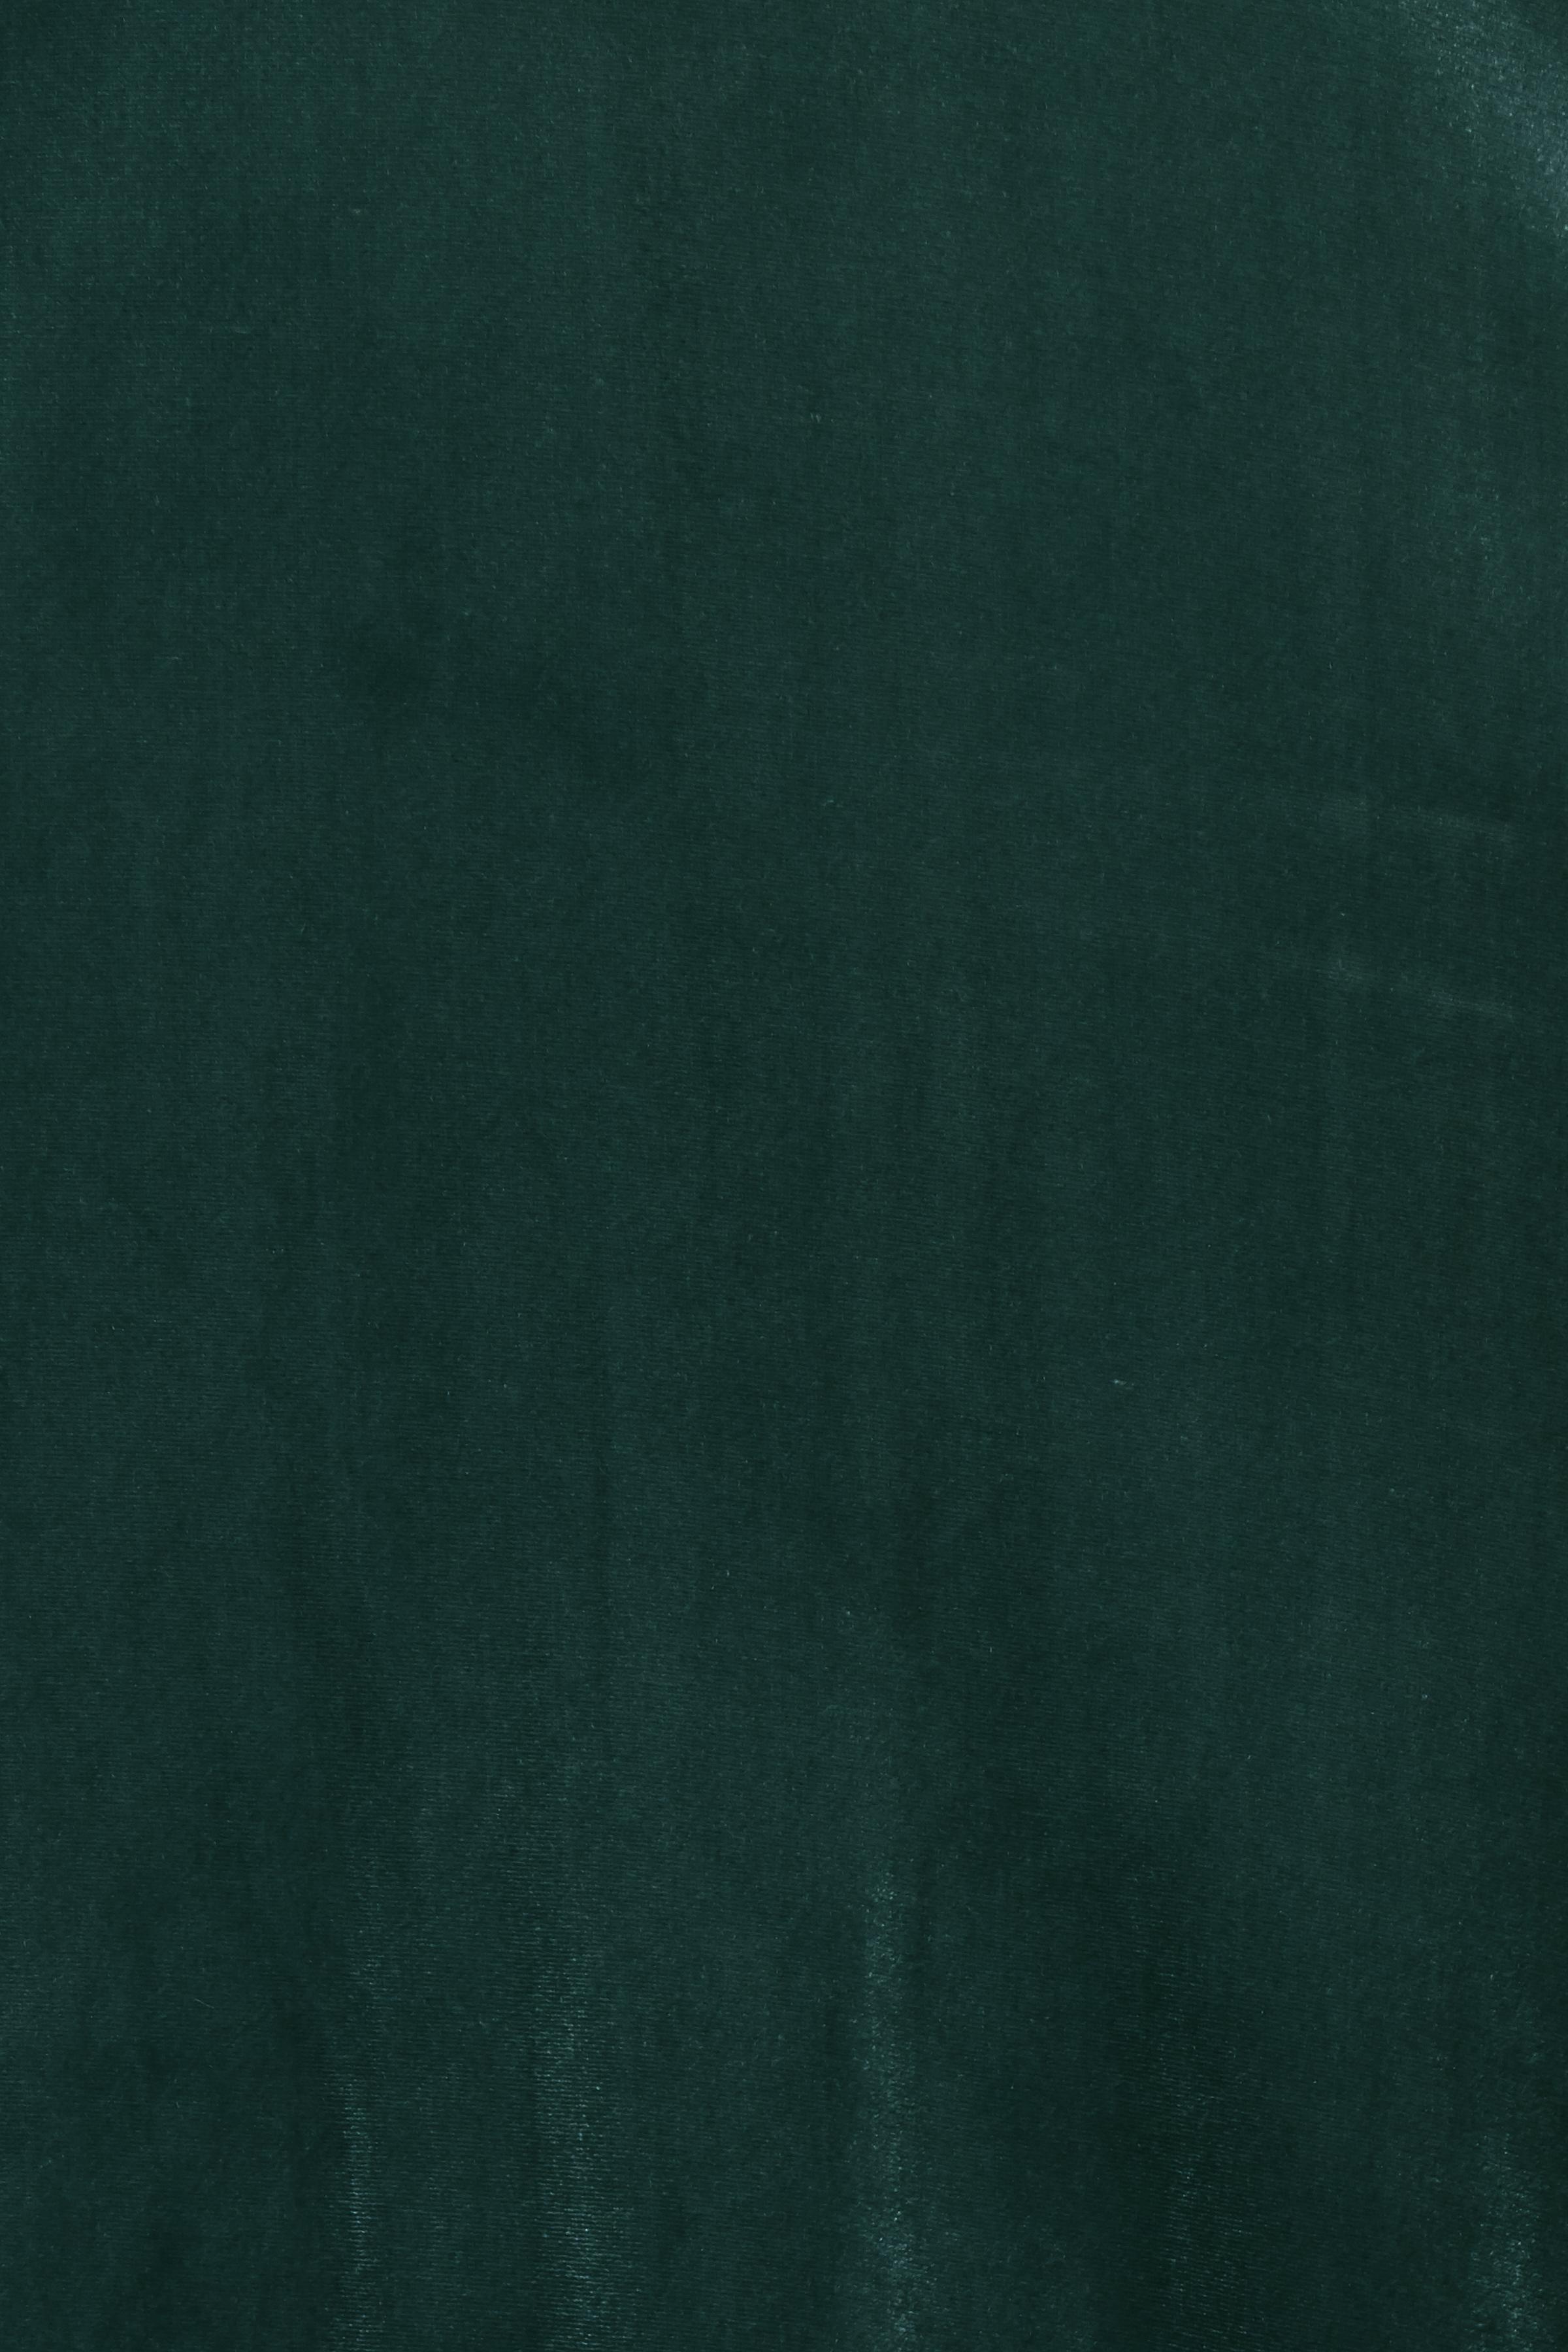 Majestic Green Strickpullover von b.young – Kaufen Sie Majestic Green Strickpullover aus Größe XS-XL hier